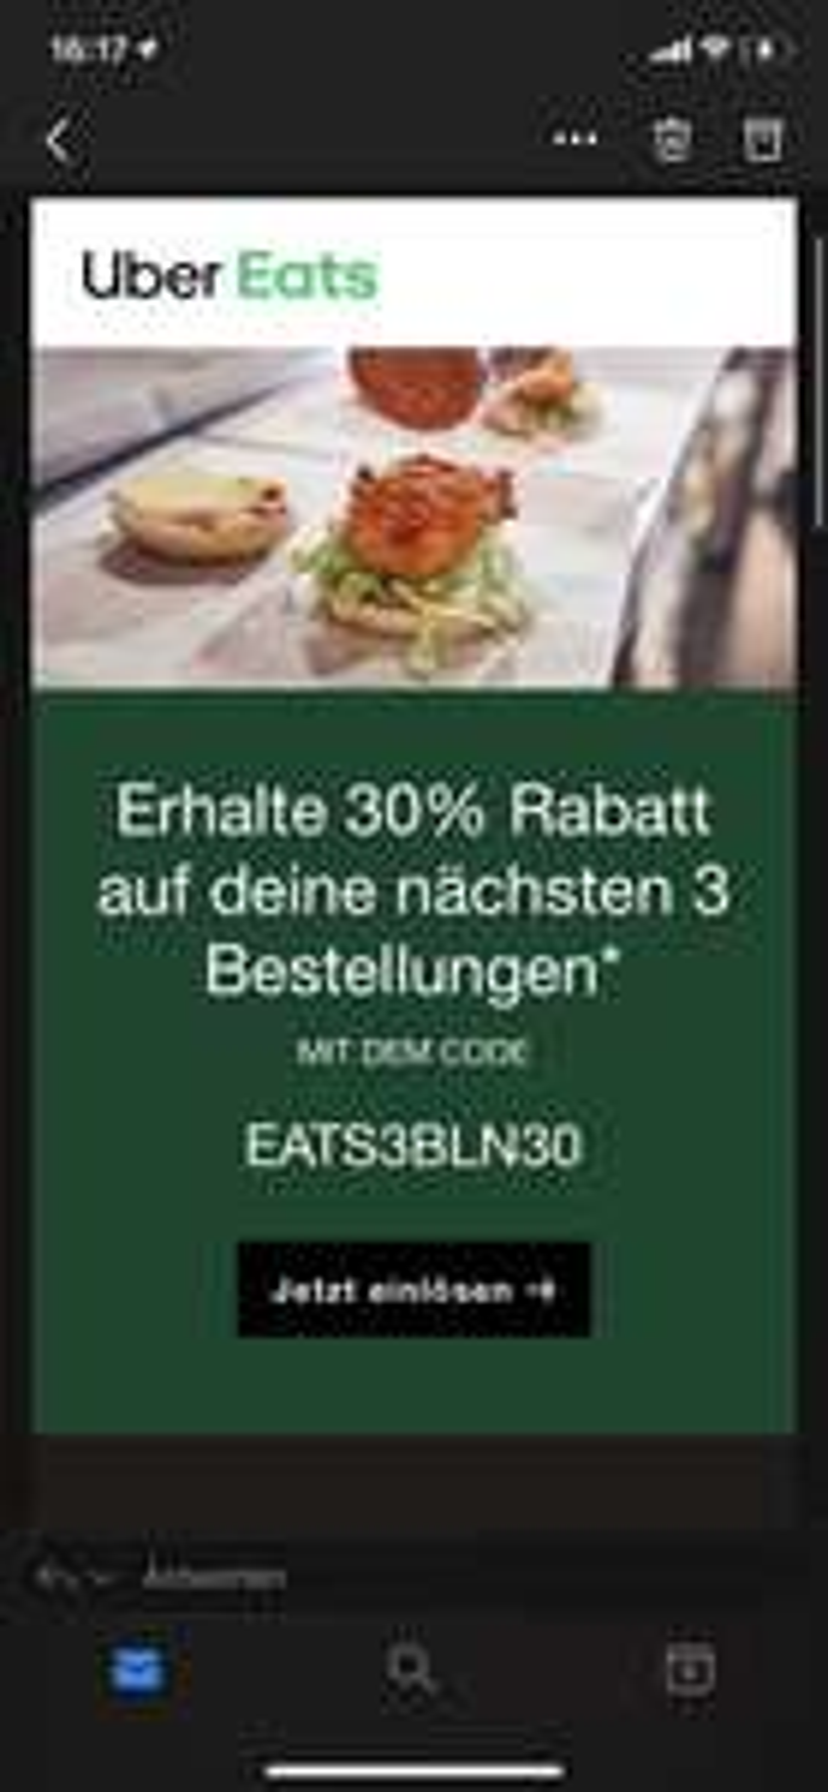 [Lokal Berlin] 3x 30% Rabatt bei Uber Eats